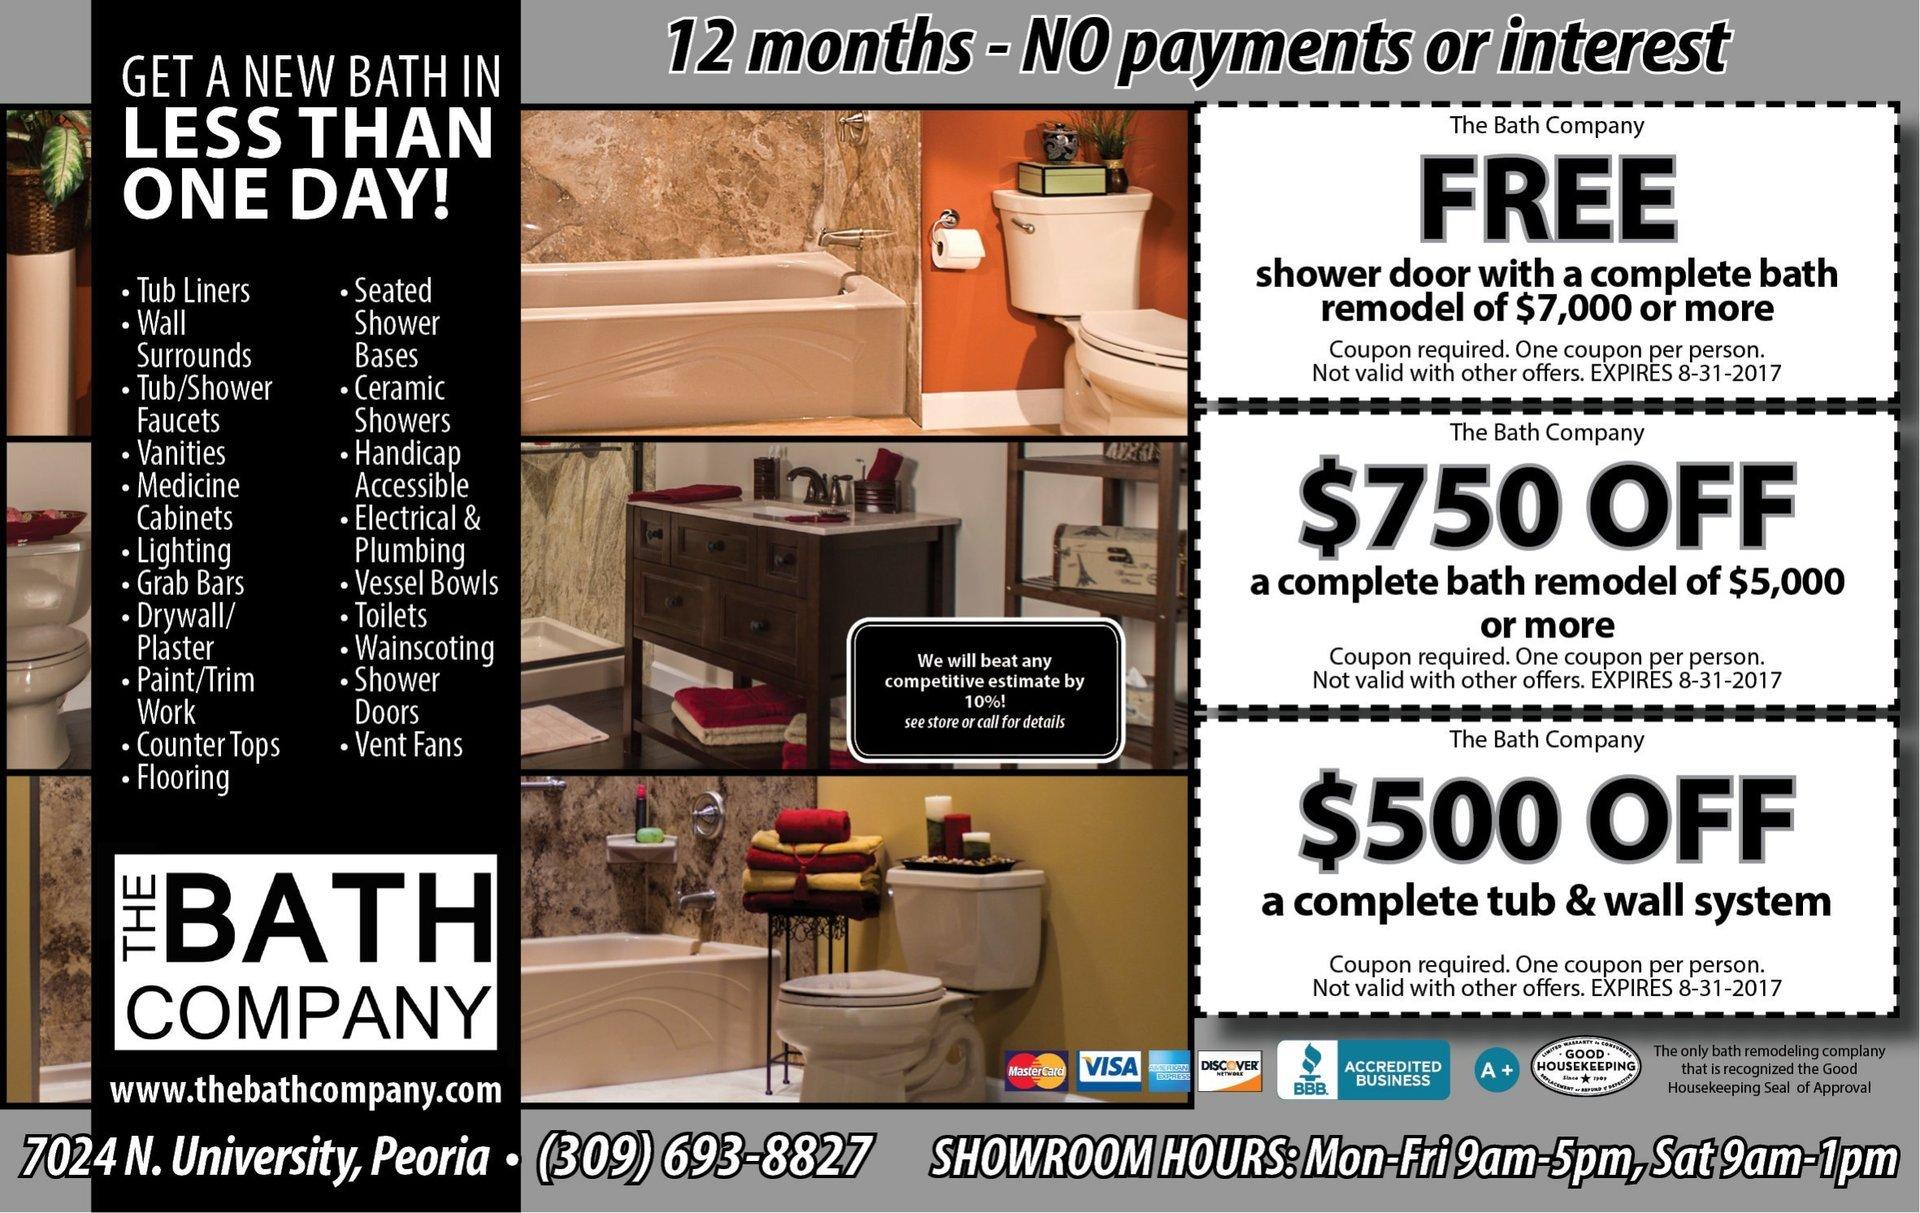 The Bath Company coupons